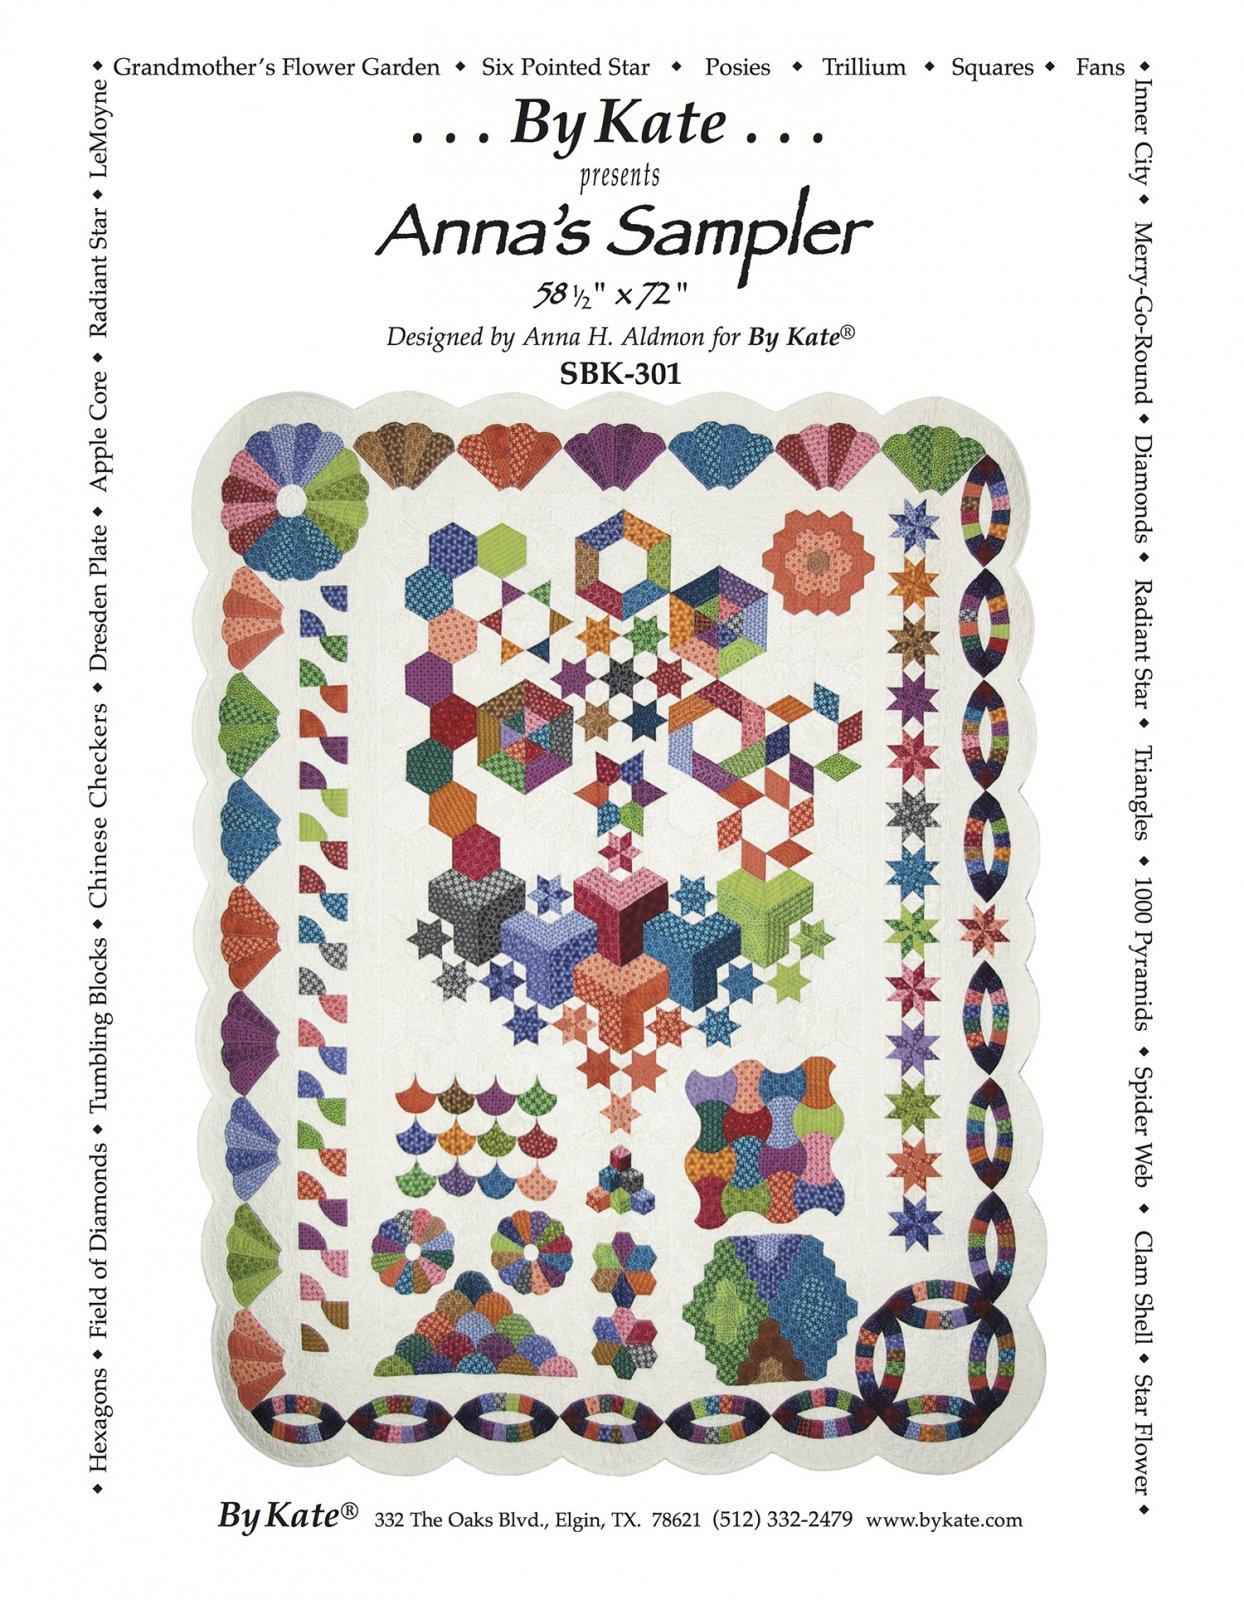 Anna's Sampler Quilt Pattern